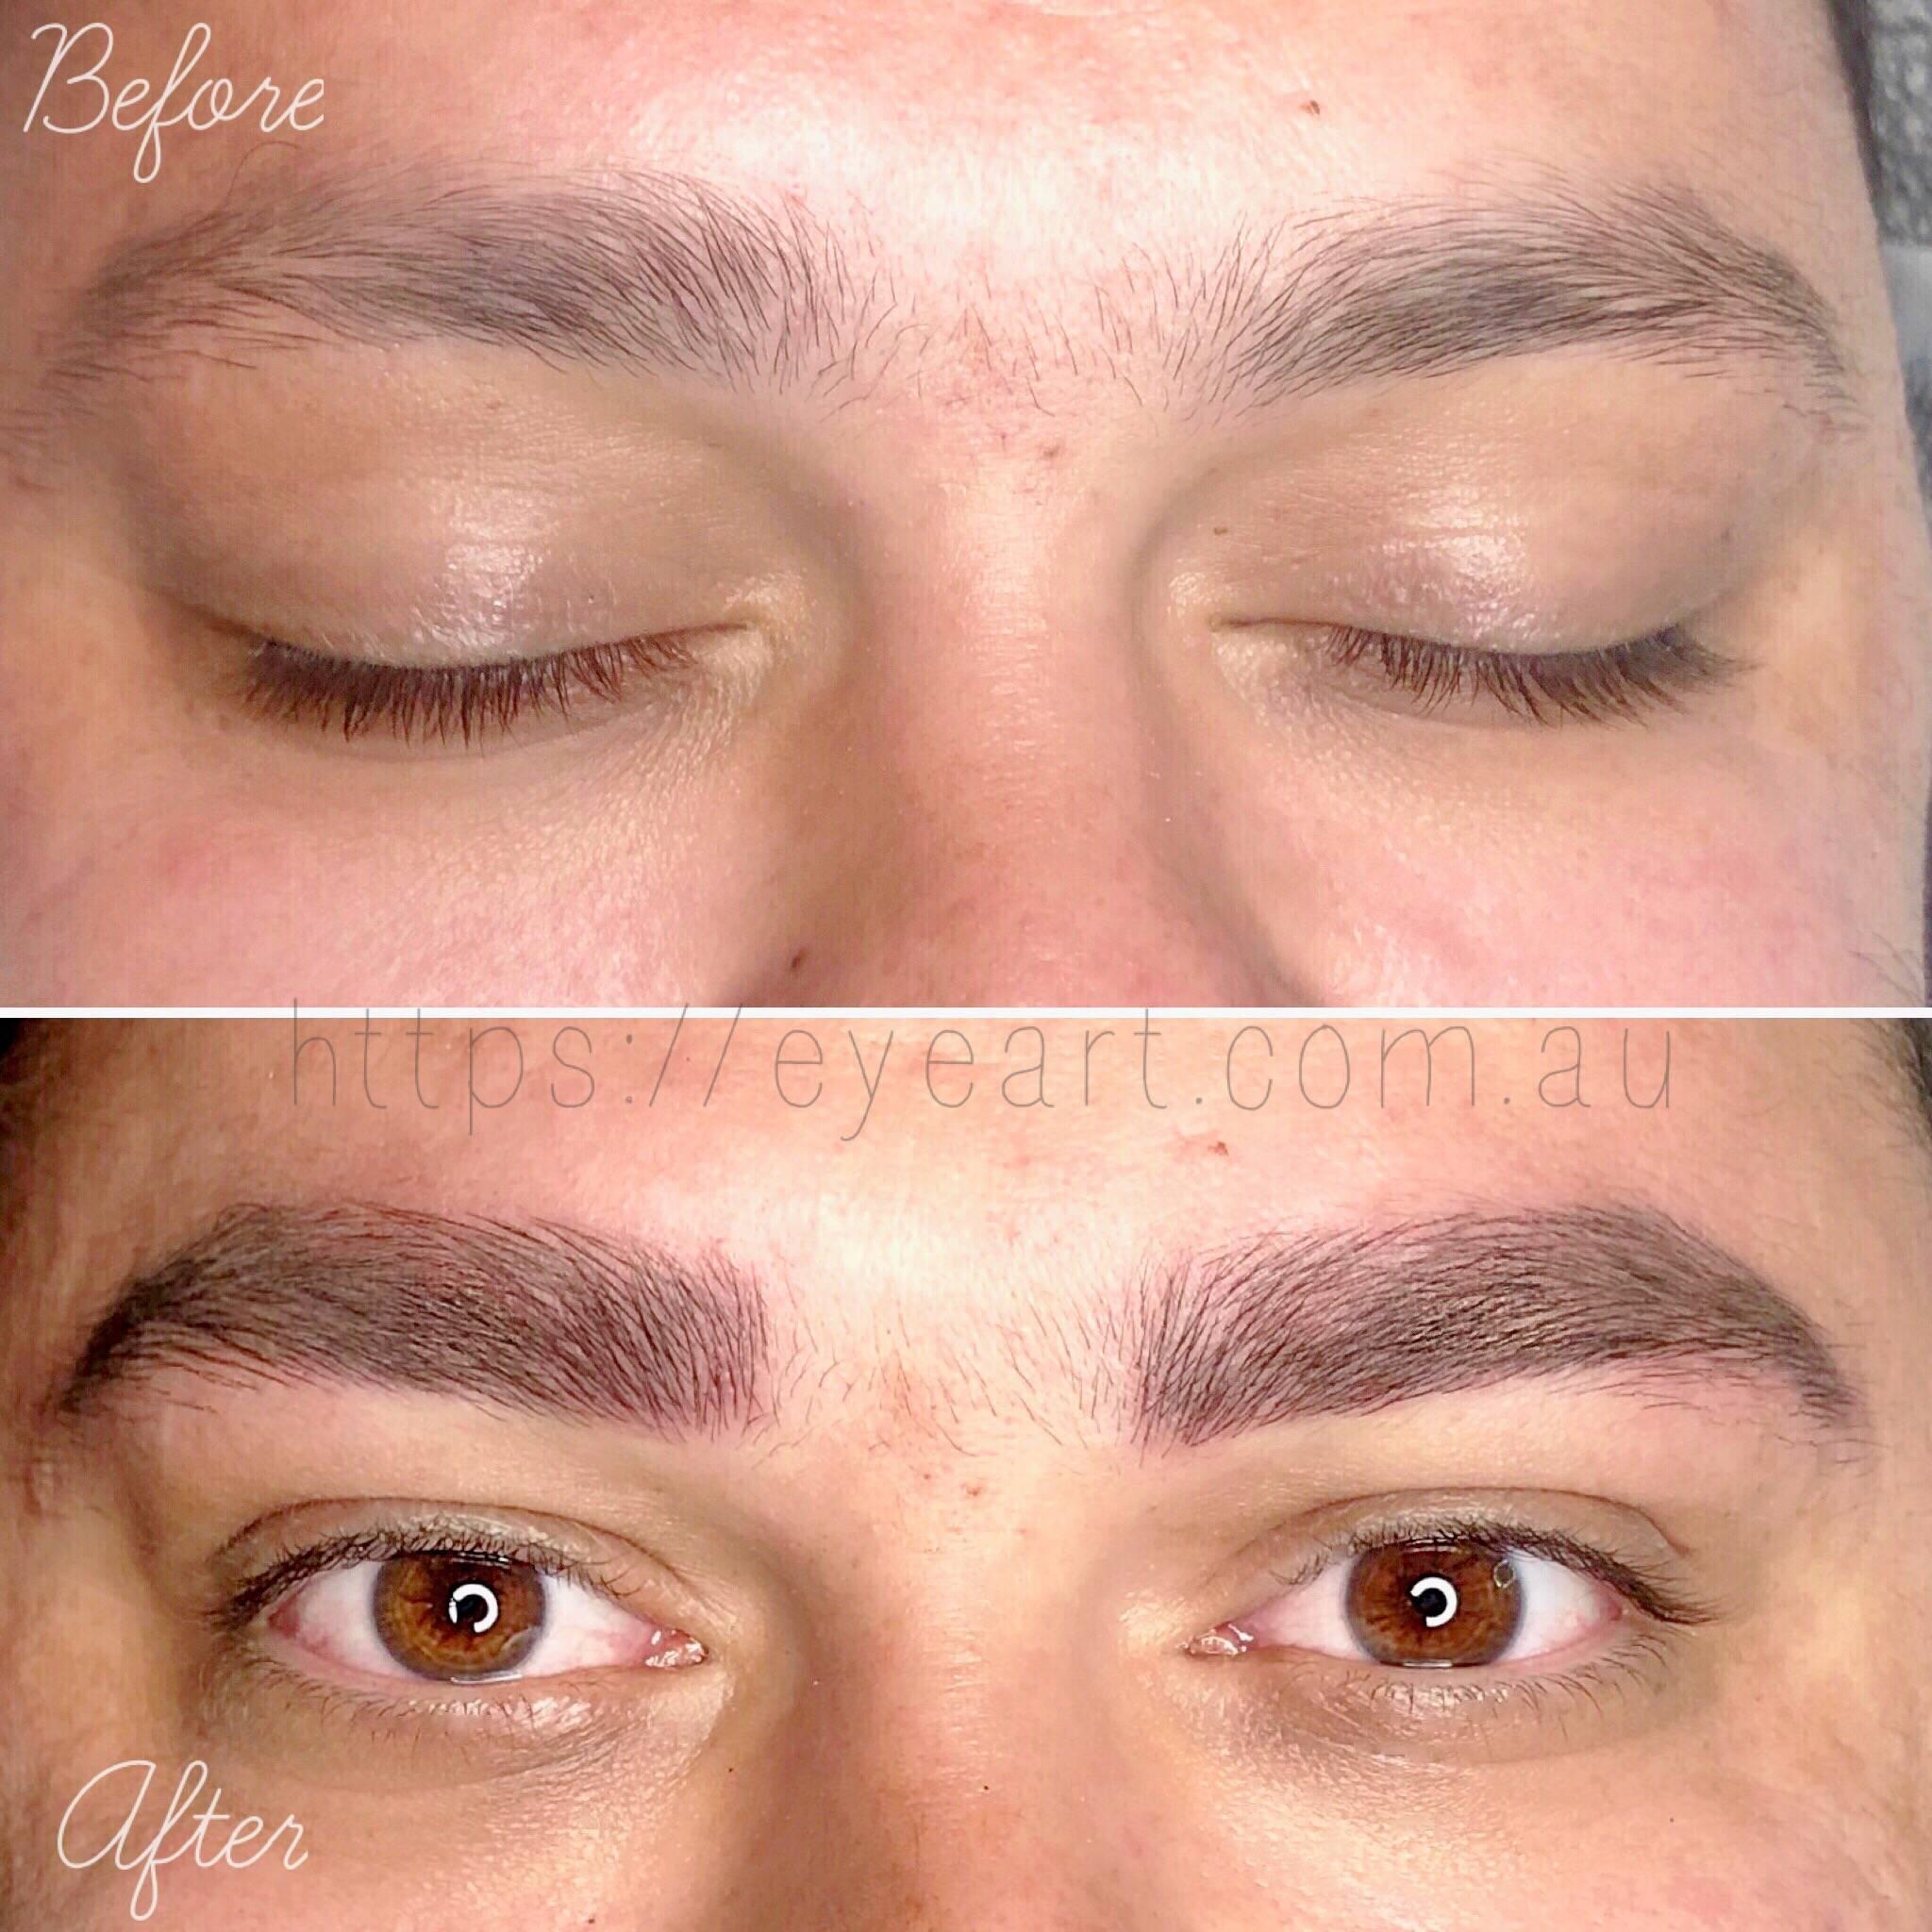 Men's Eyebrow Microblading